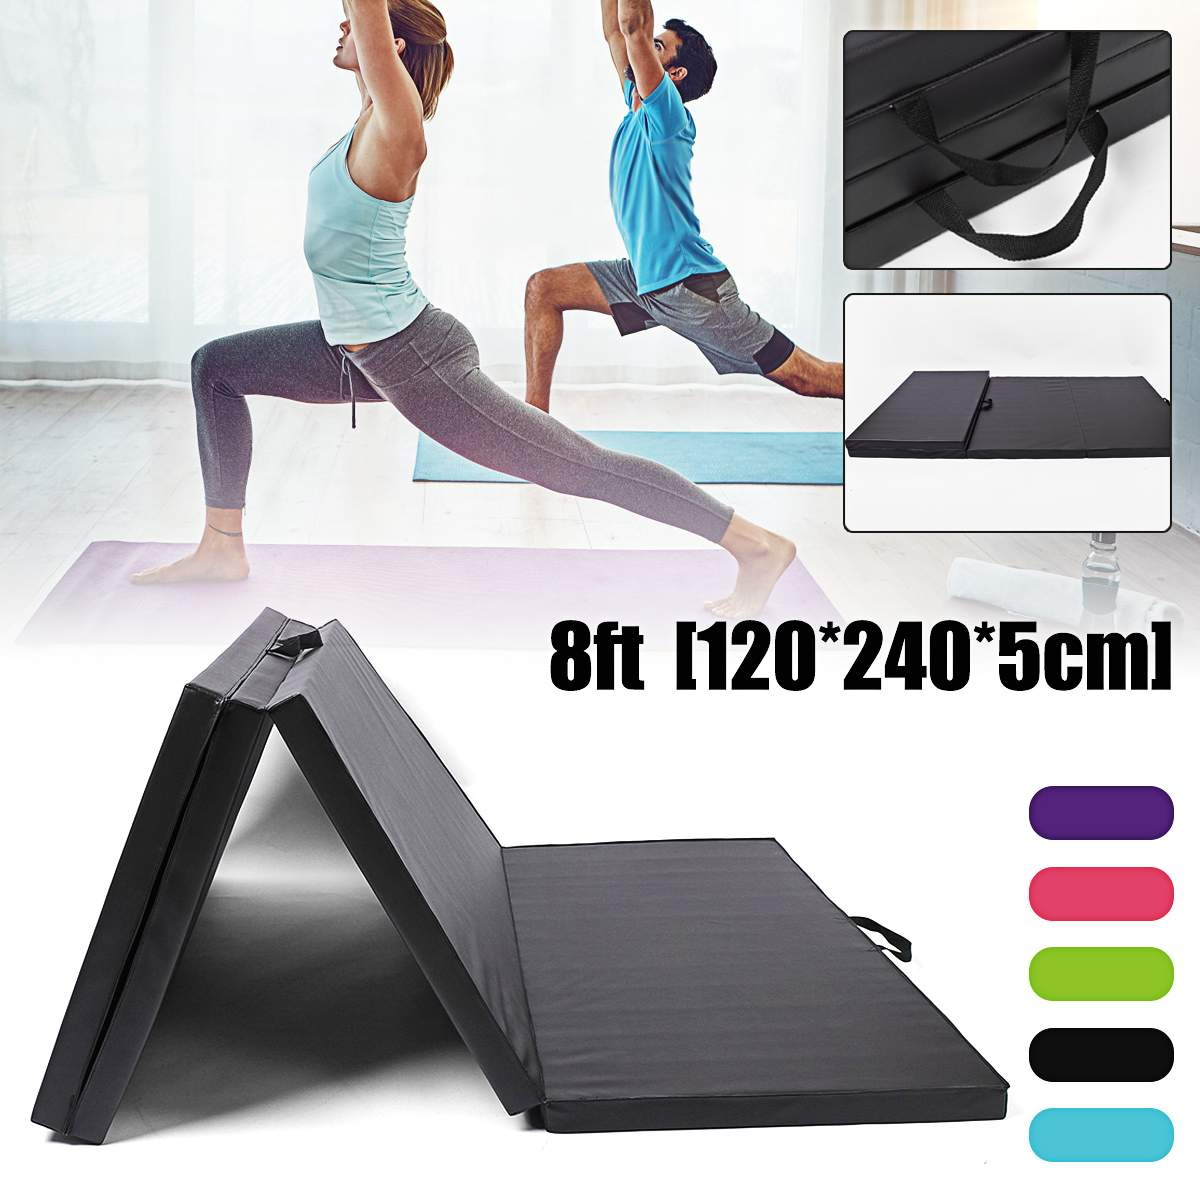 Aliexpress Com Buy 120 240 5cm Folding Gymnastics Mat